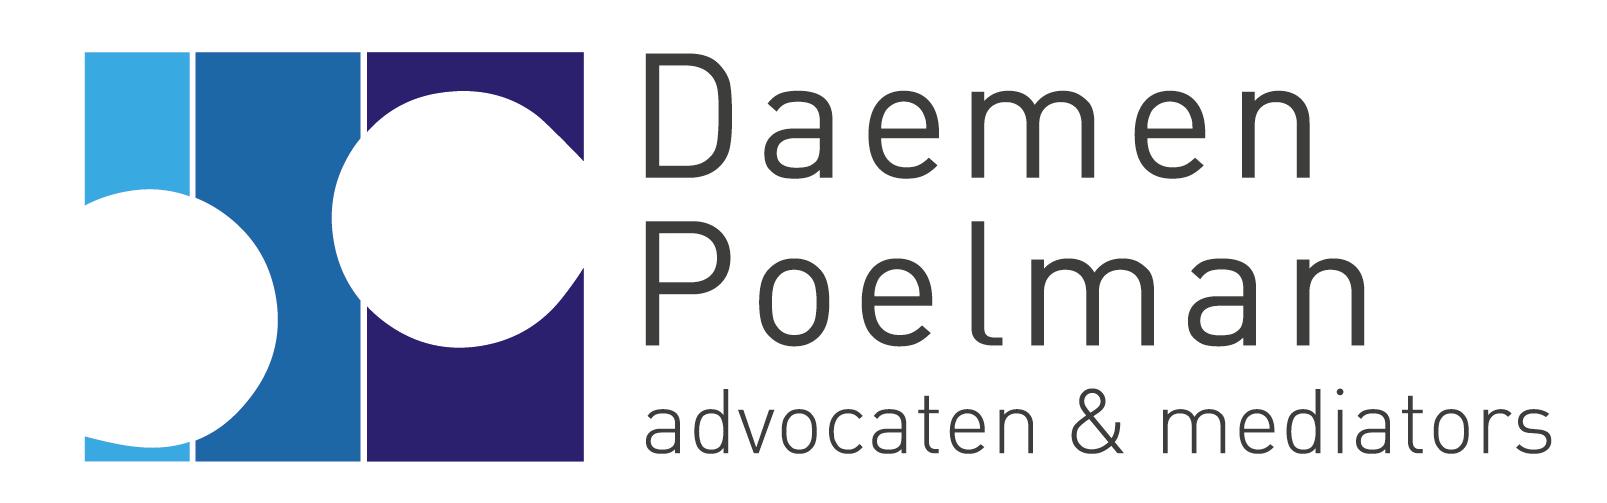 Daemen Poelman Berends Advocaten Limburg - Brunssum